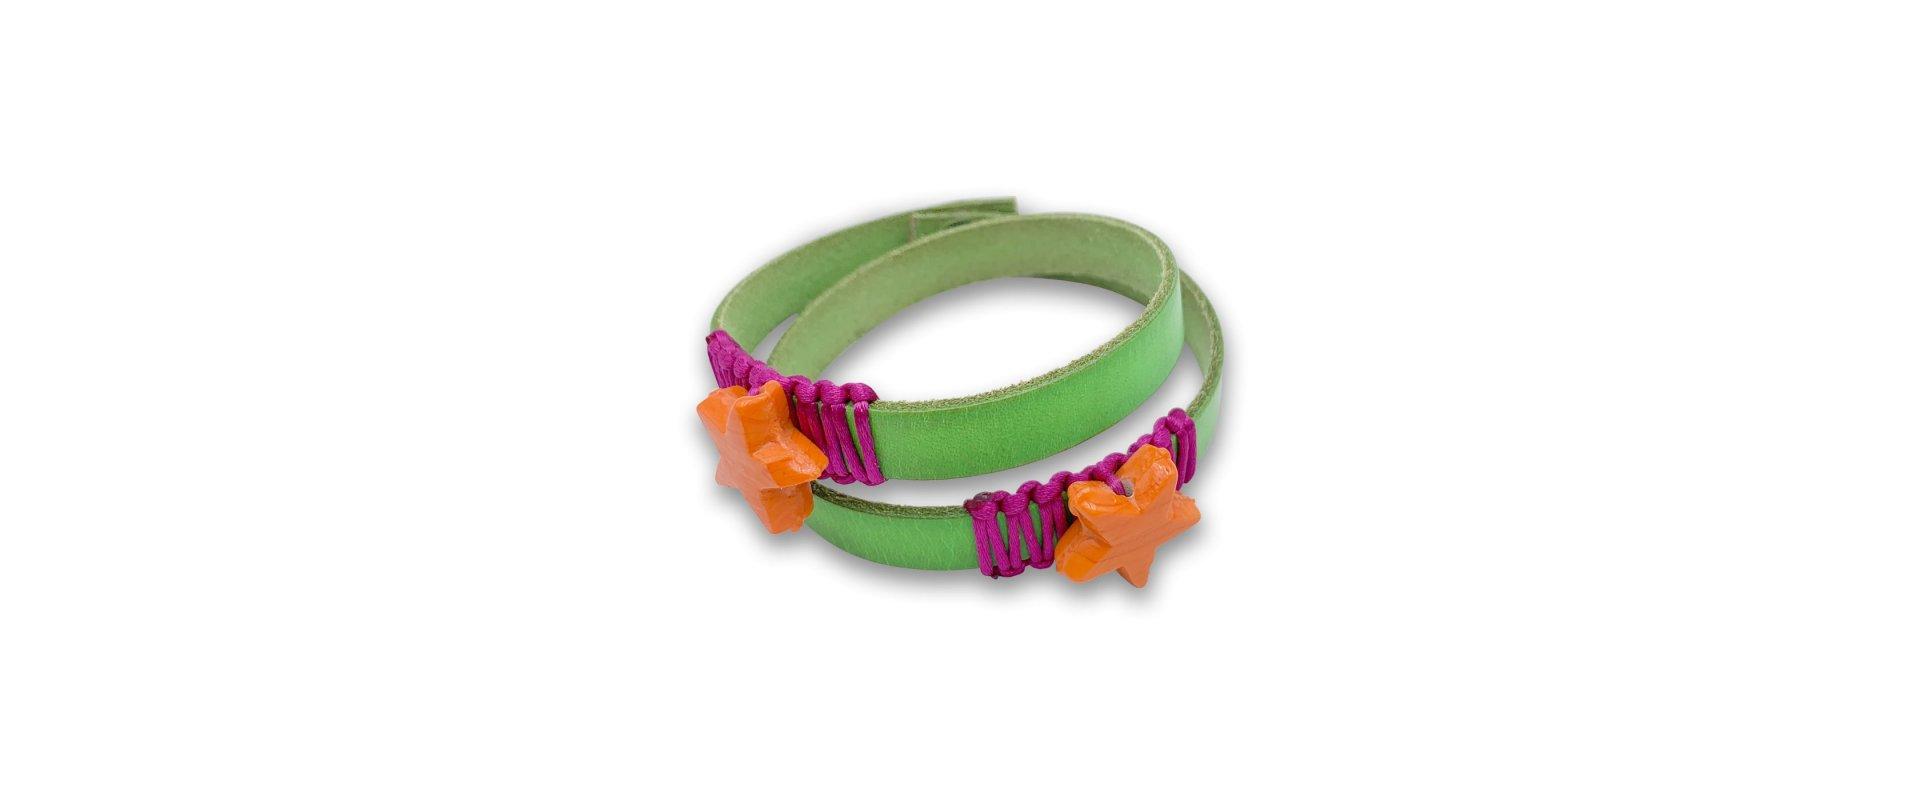 Green spiral bracelet in online store anabi.online